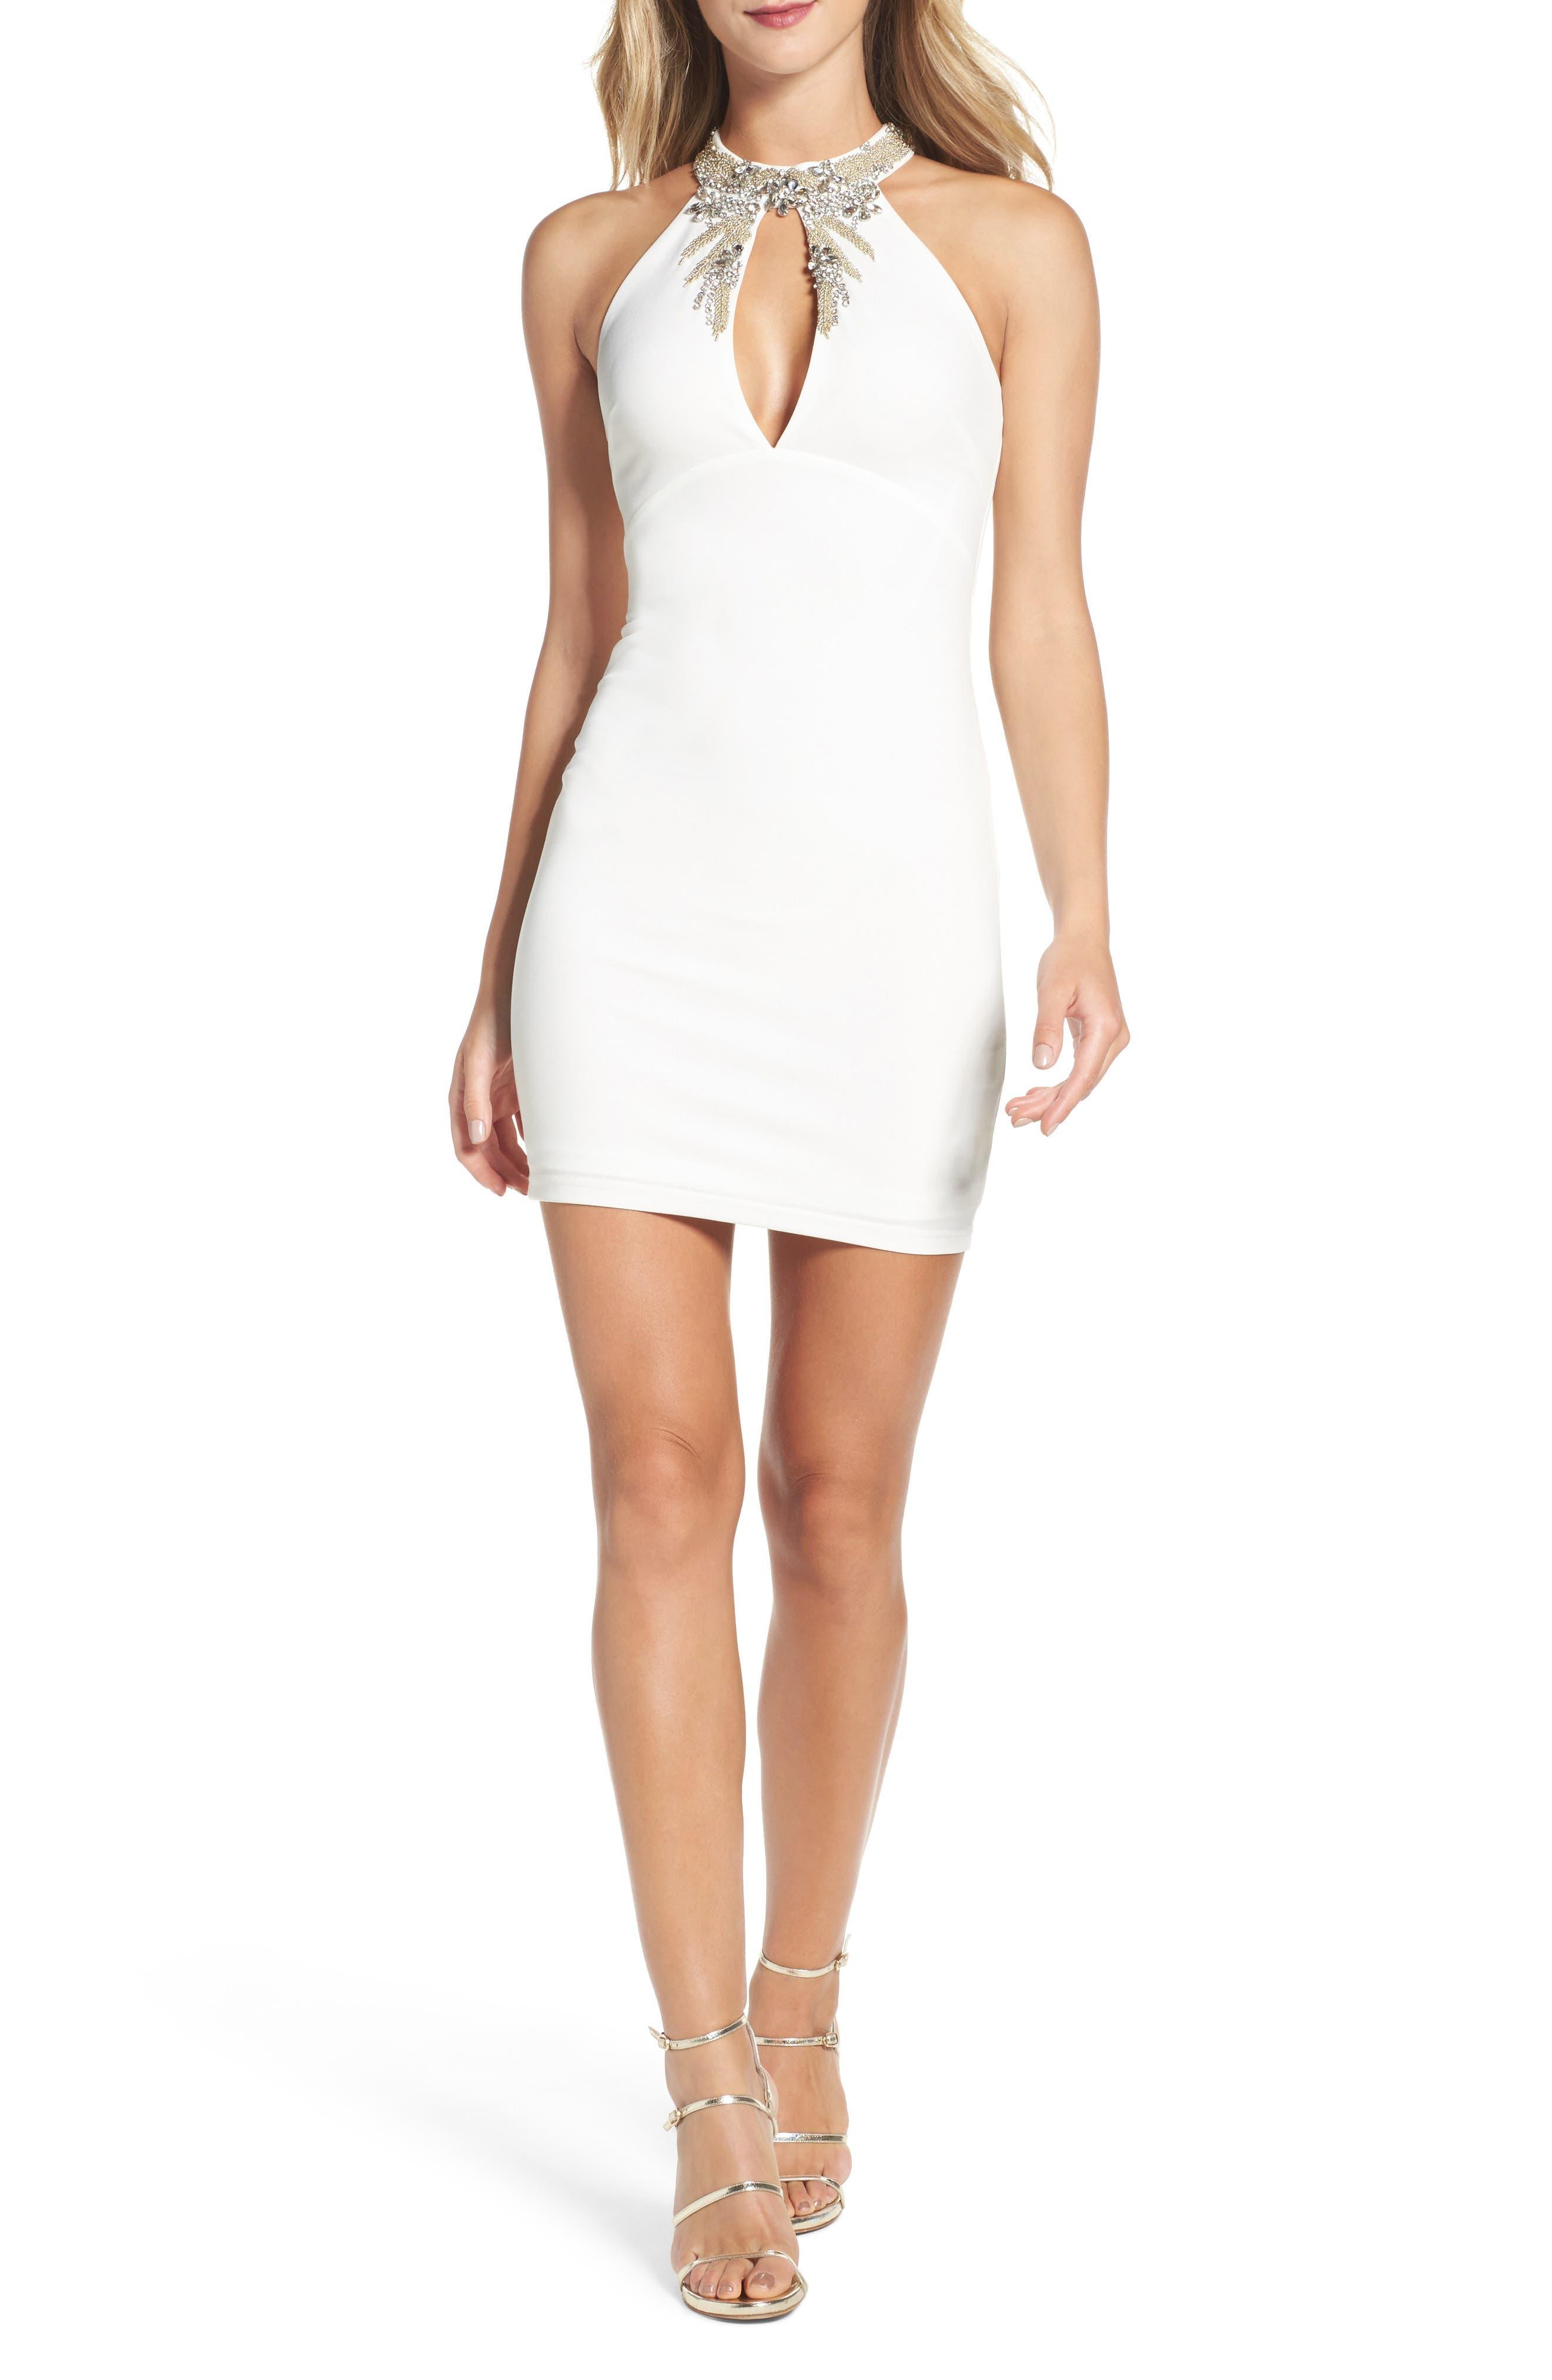 Main Image - Lulus Alluring Evening Beaded Body-Con Dress